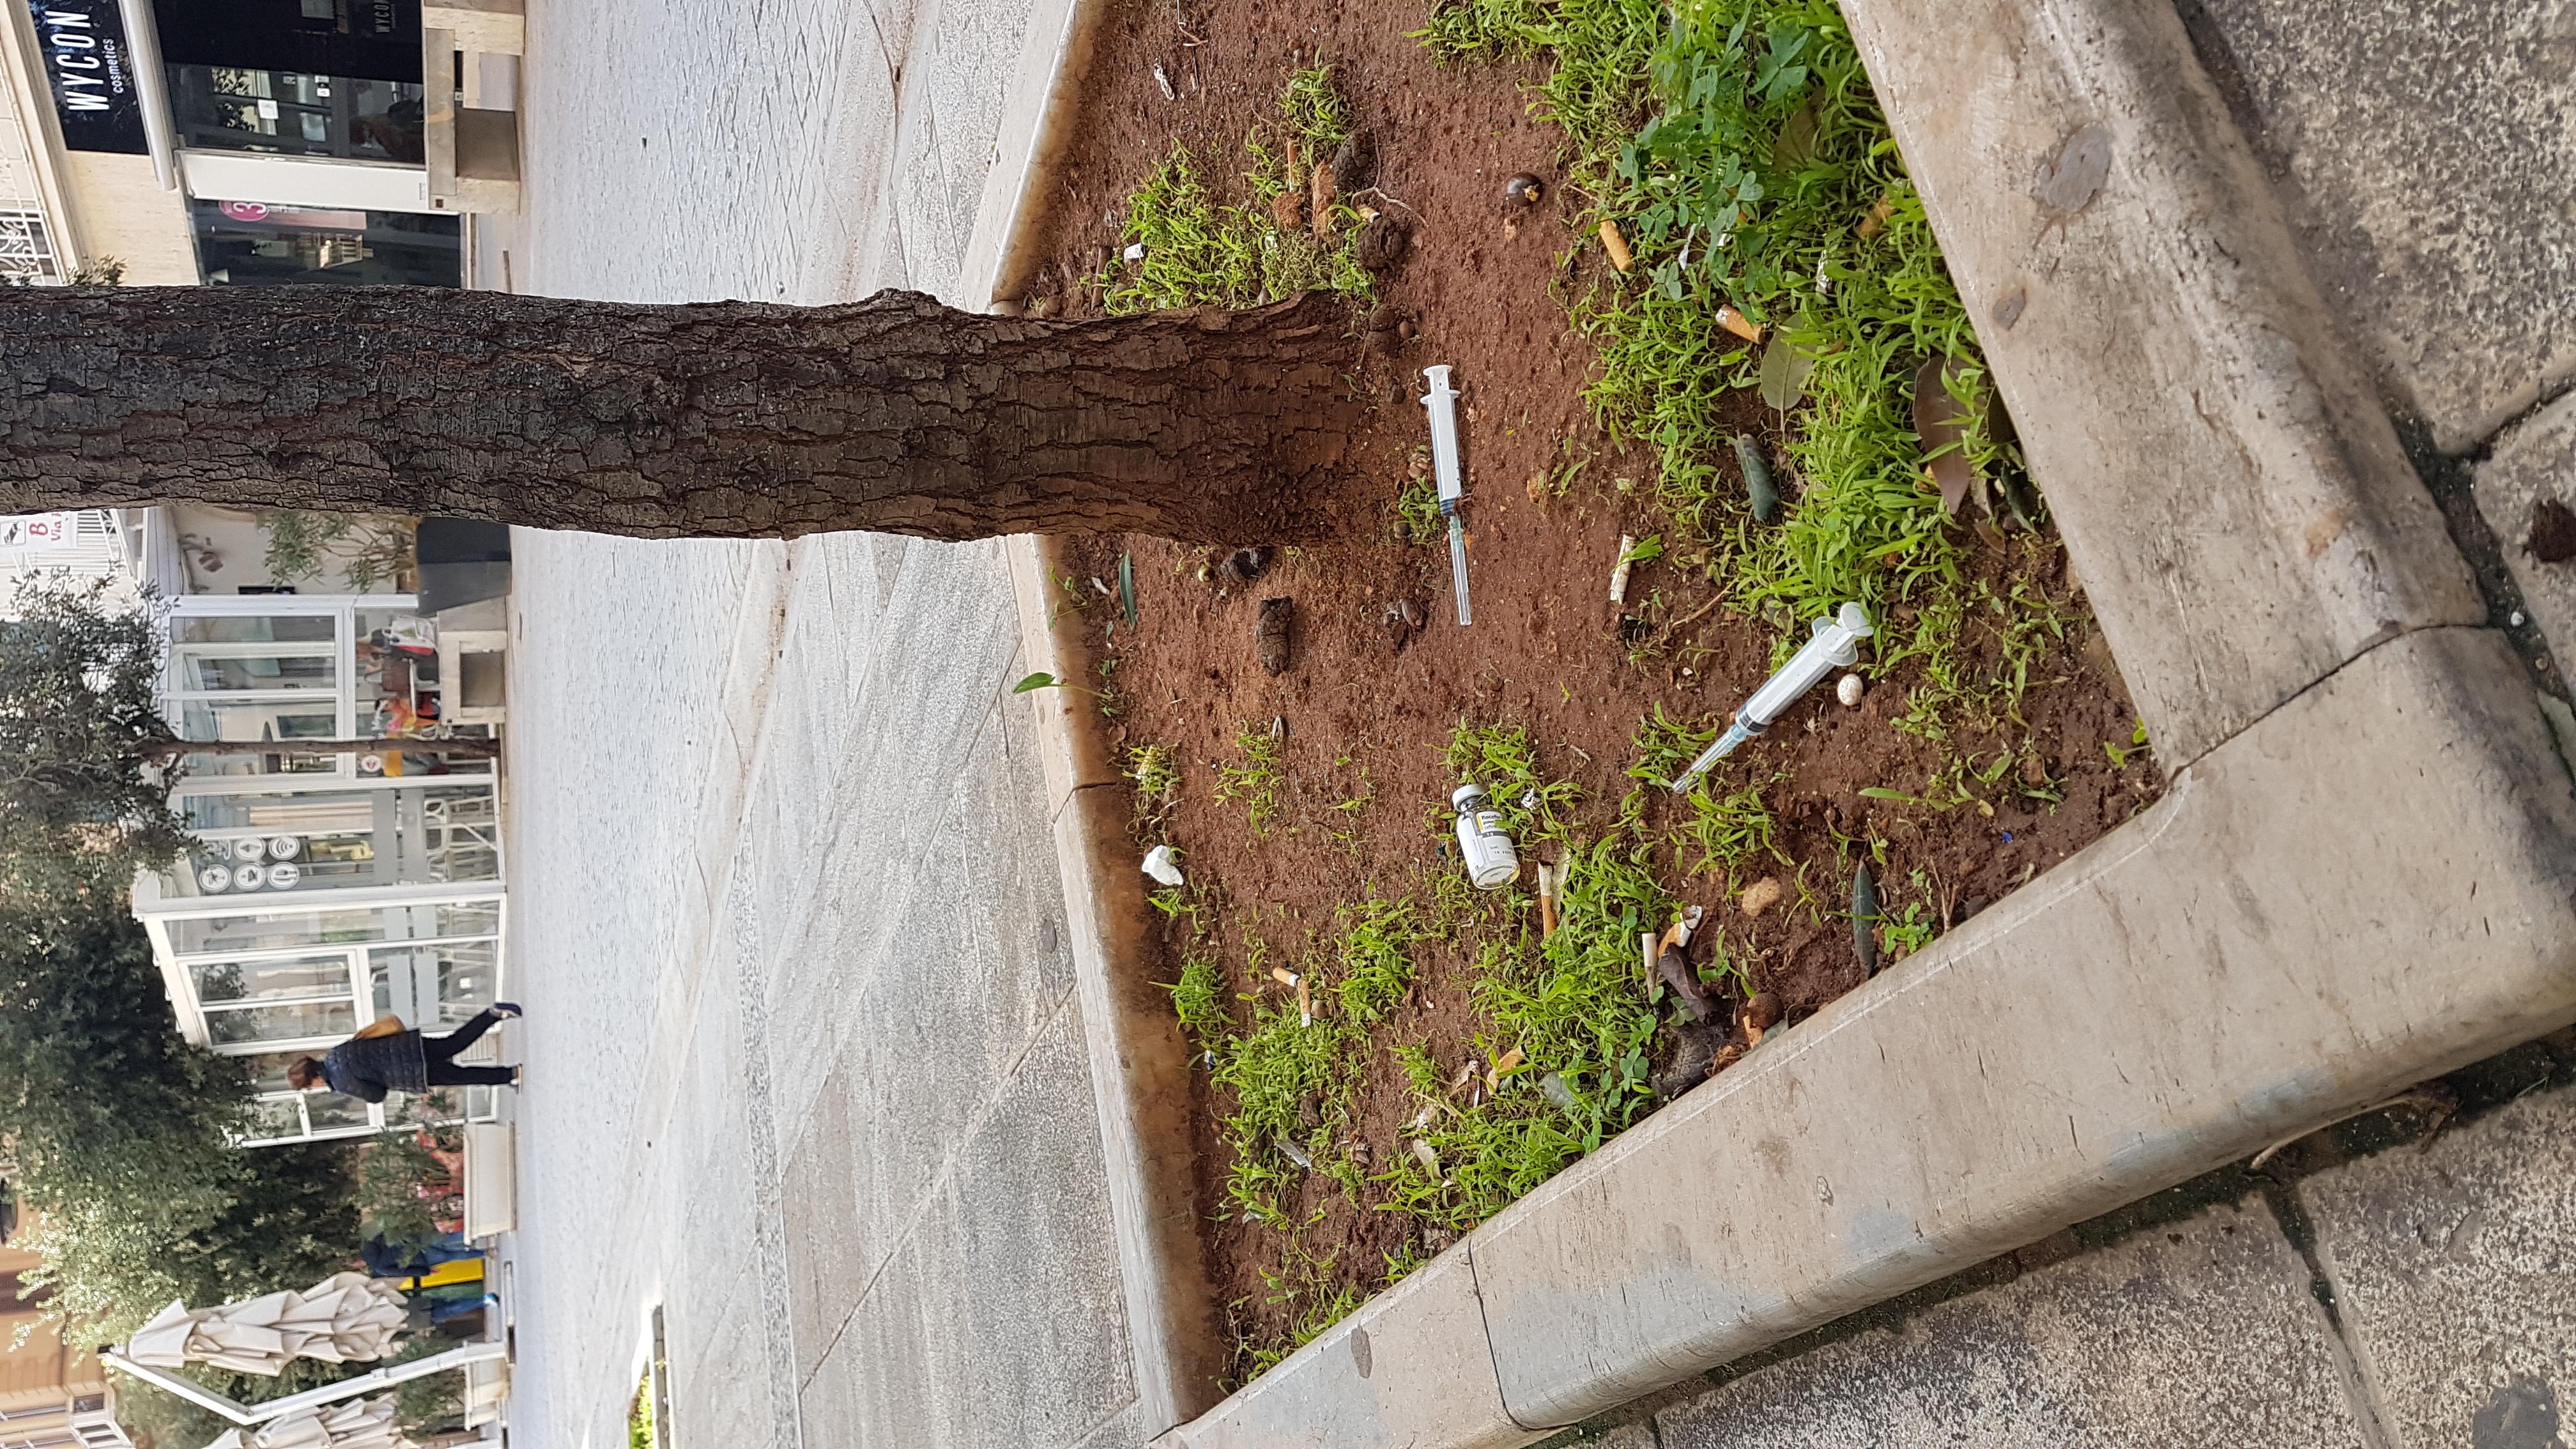 Degrado a Marsala. Le siringhe per terra in via Roma - Tp24